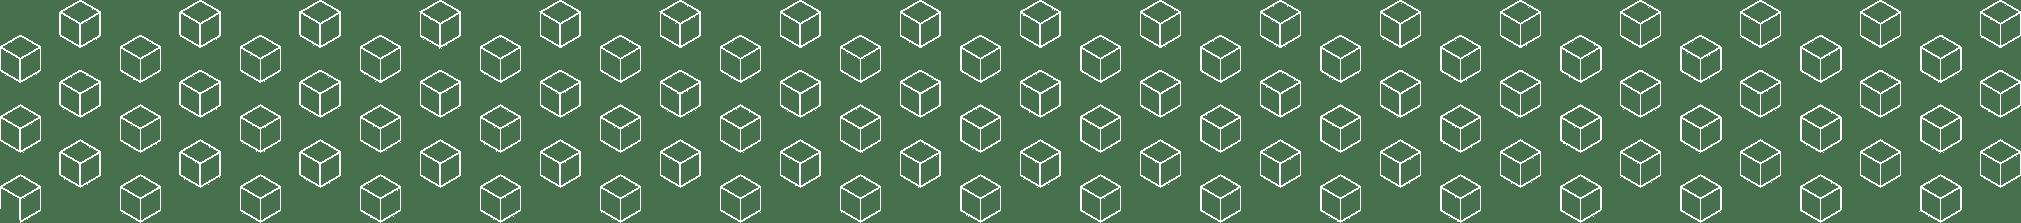 White cubes grid image